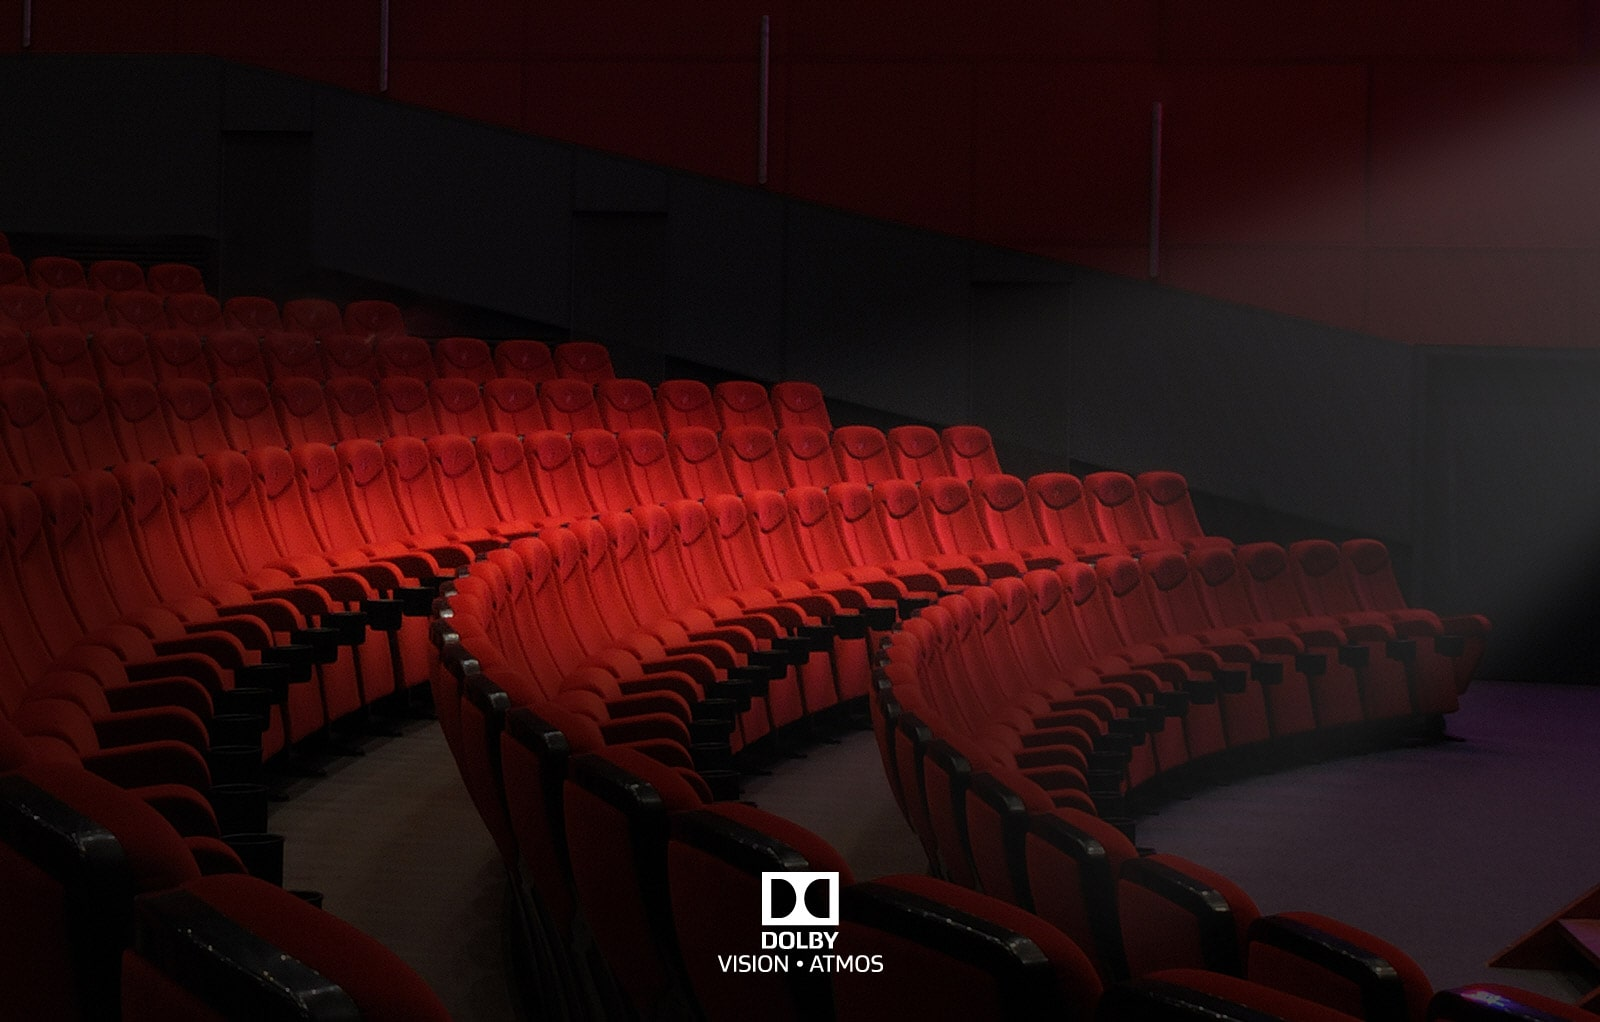 OLEDXXB7P_B_Dolby_vision_atmos_Desktop_24072017_D